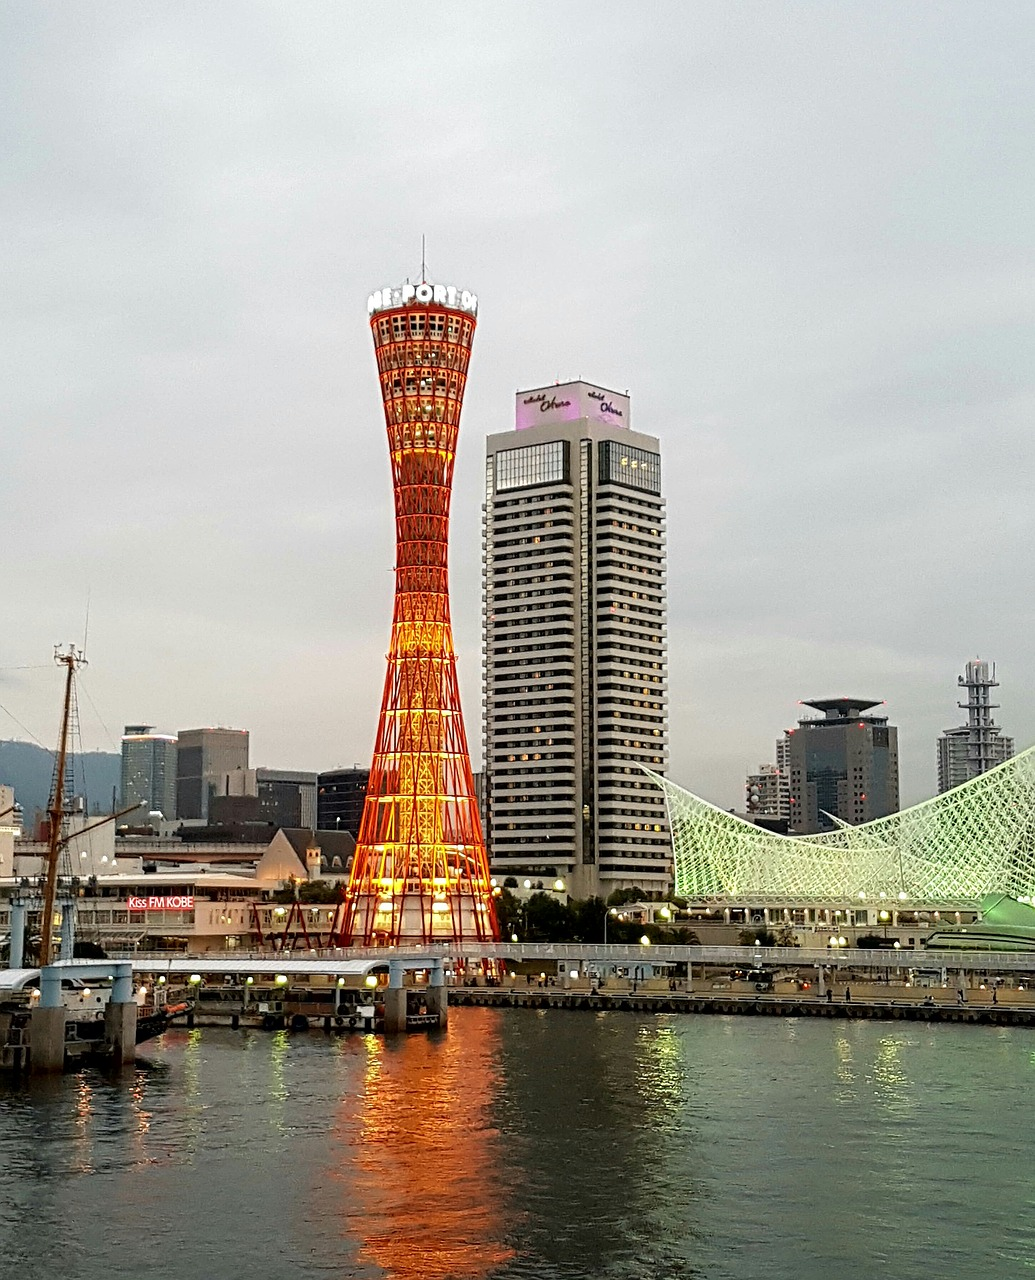 KobePortTower by Weddyyy for PixaBay - 15 Things To Do In Kobe, Japan